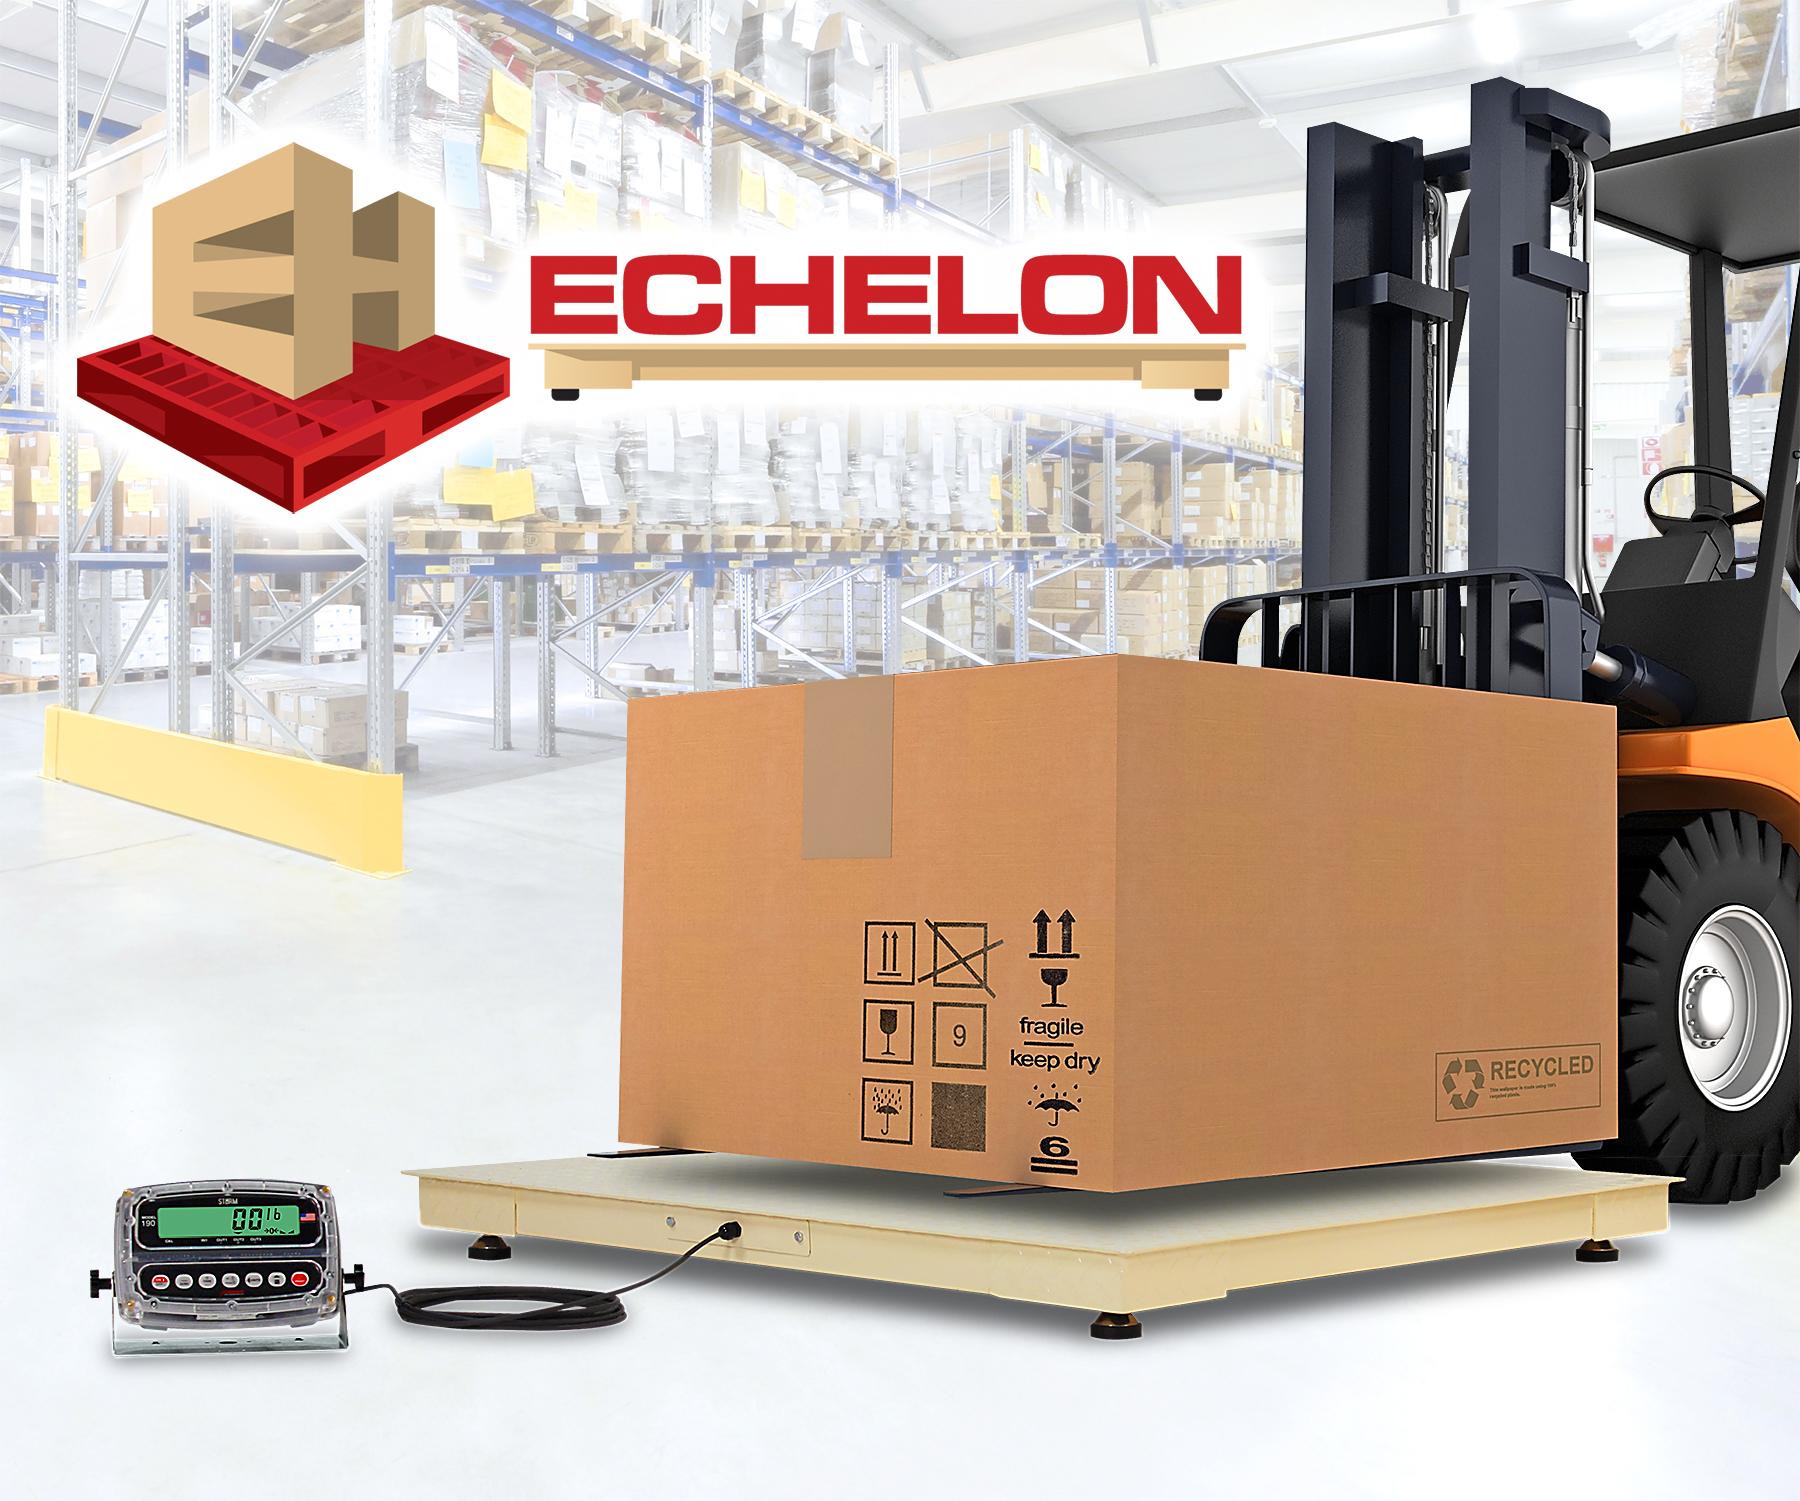 Cardinal Scale's New Echelon EH Series Economical Floor